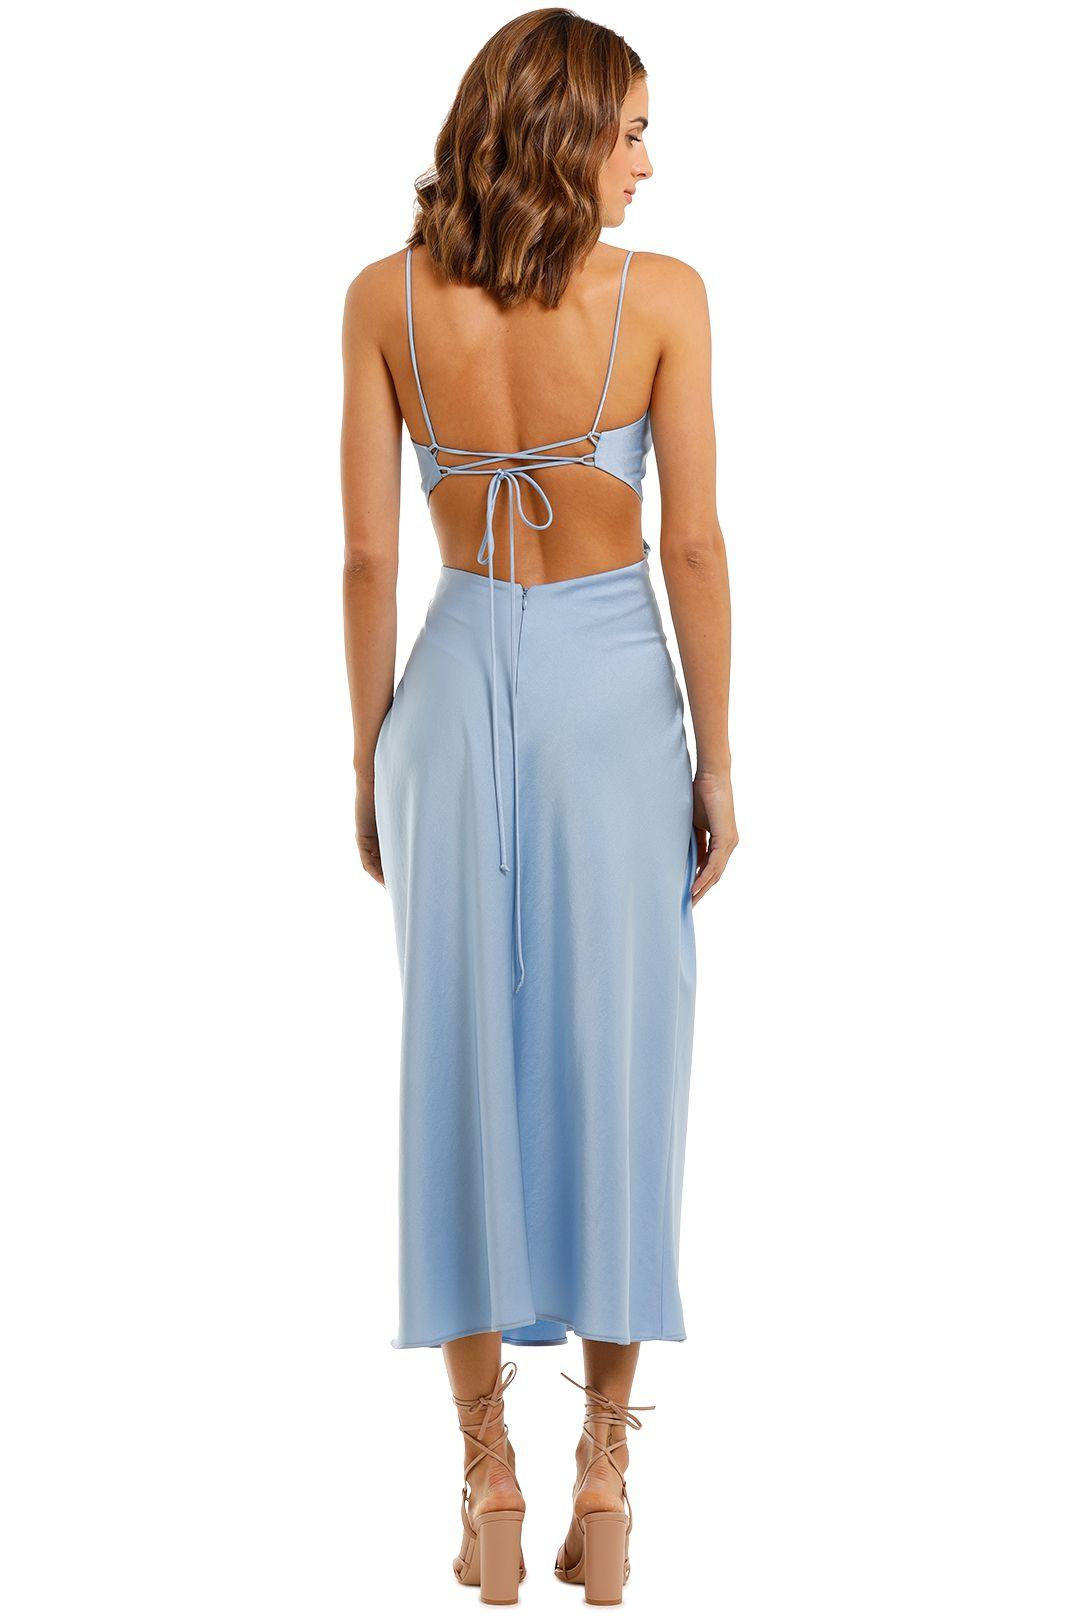 Bec and Bridge Raquel Baby Blue Midi Dress Backless